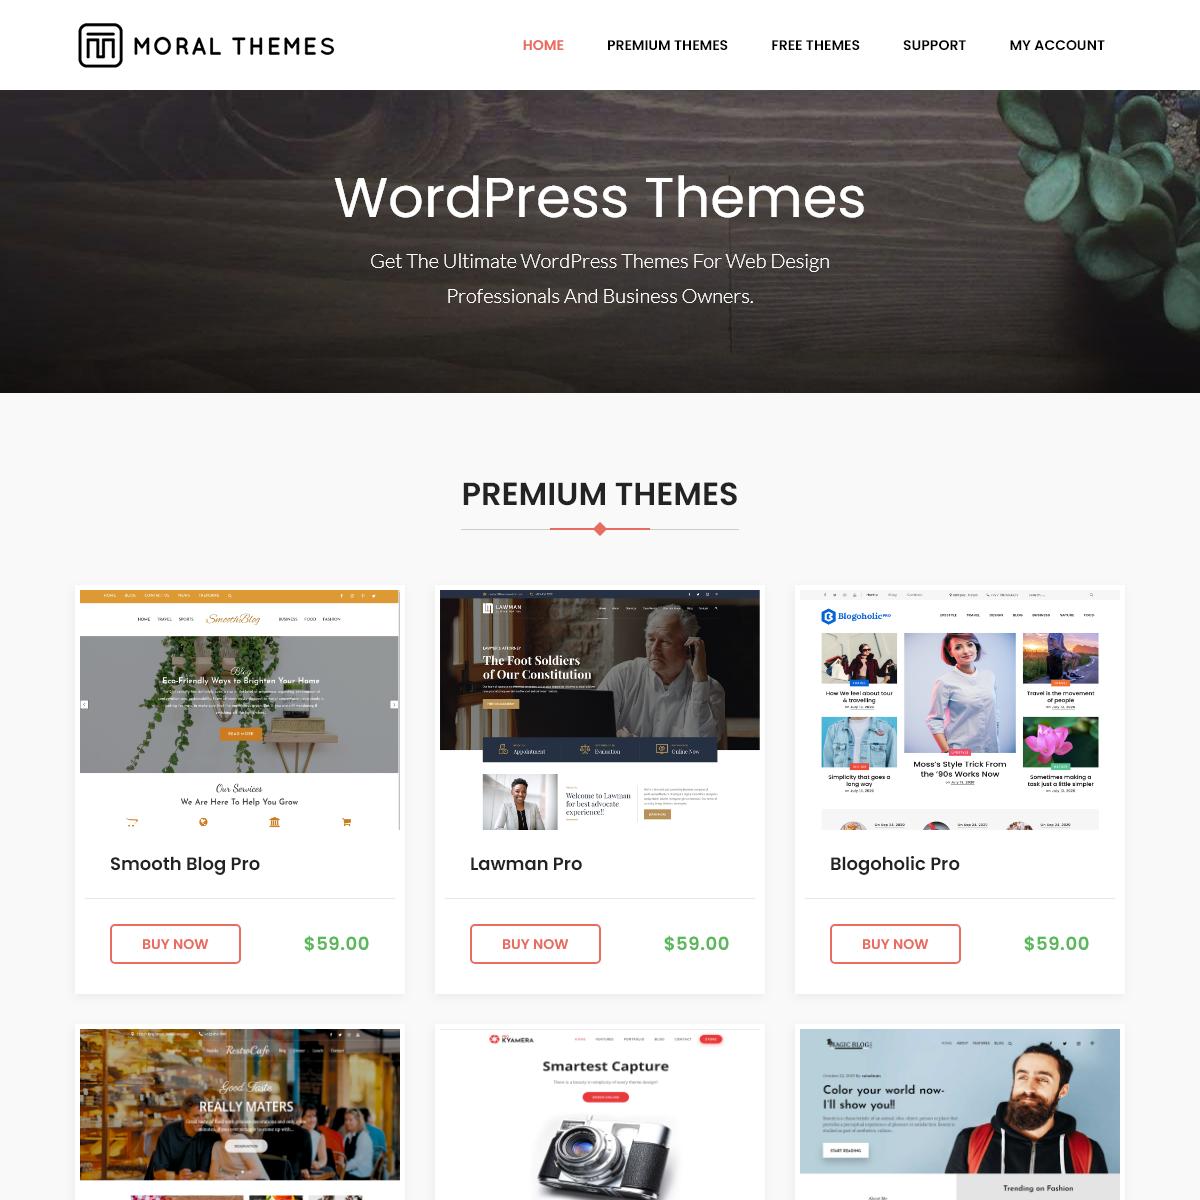 Moral Themes - WordPress Free and Premium Themes